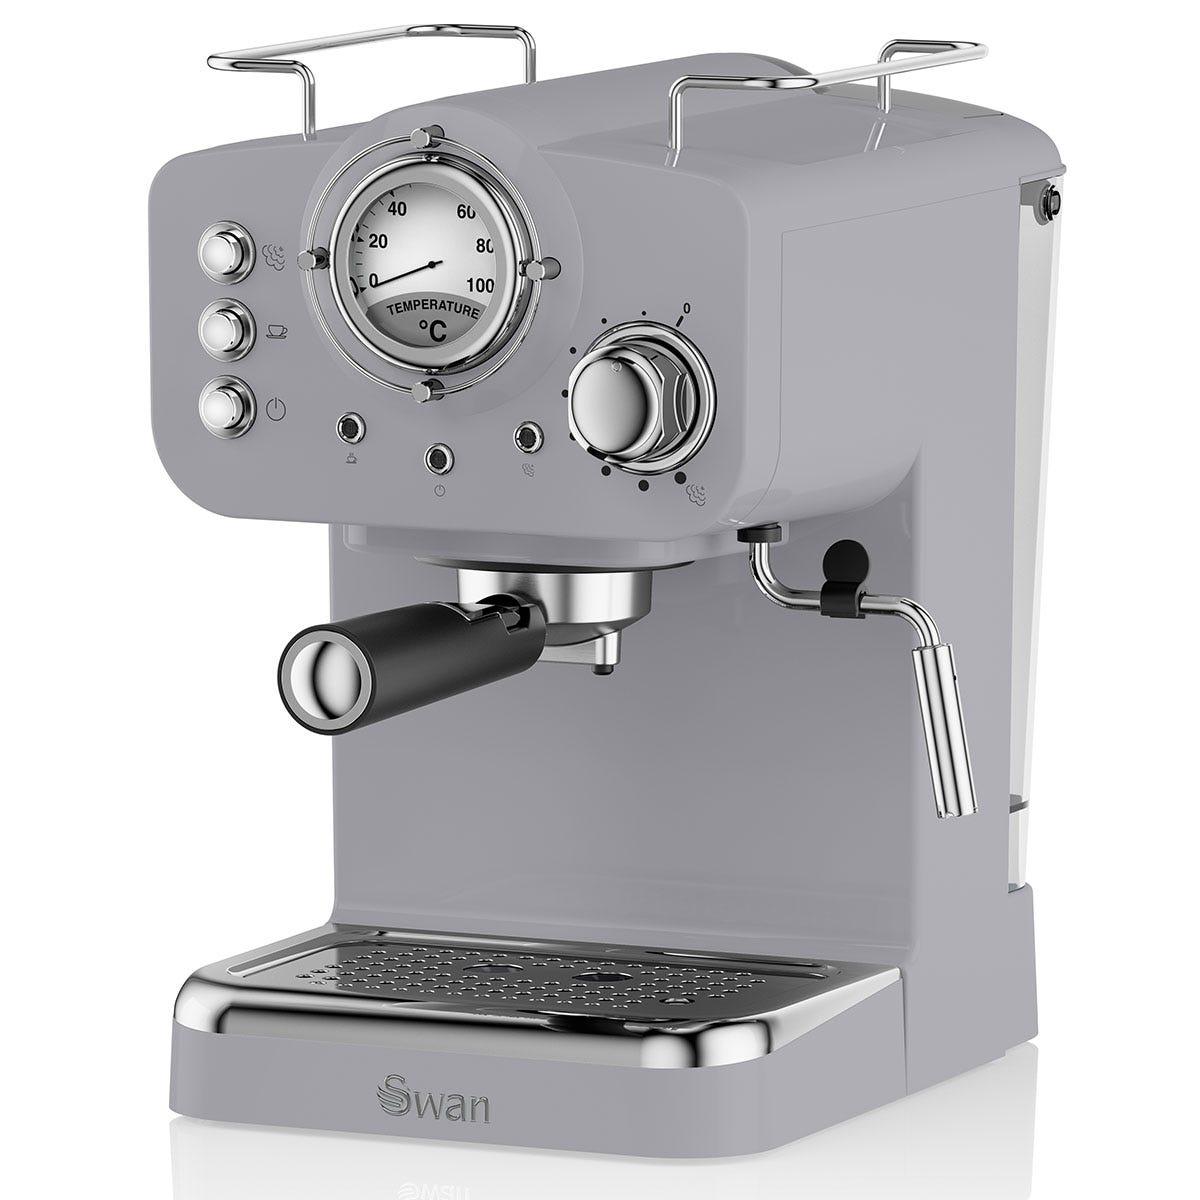 Swan SK22110GRN Retro Pump Espresso Coffee Machine - Grey